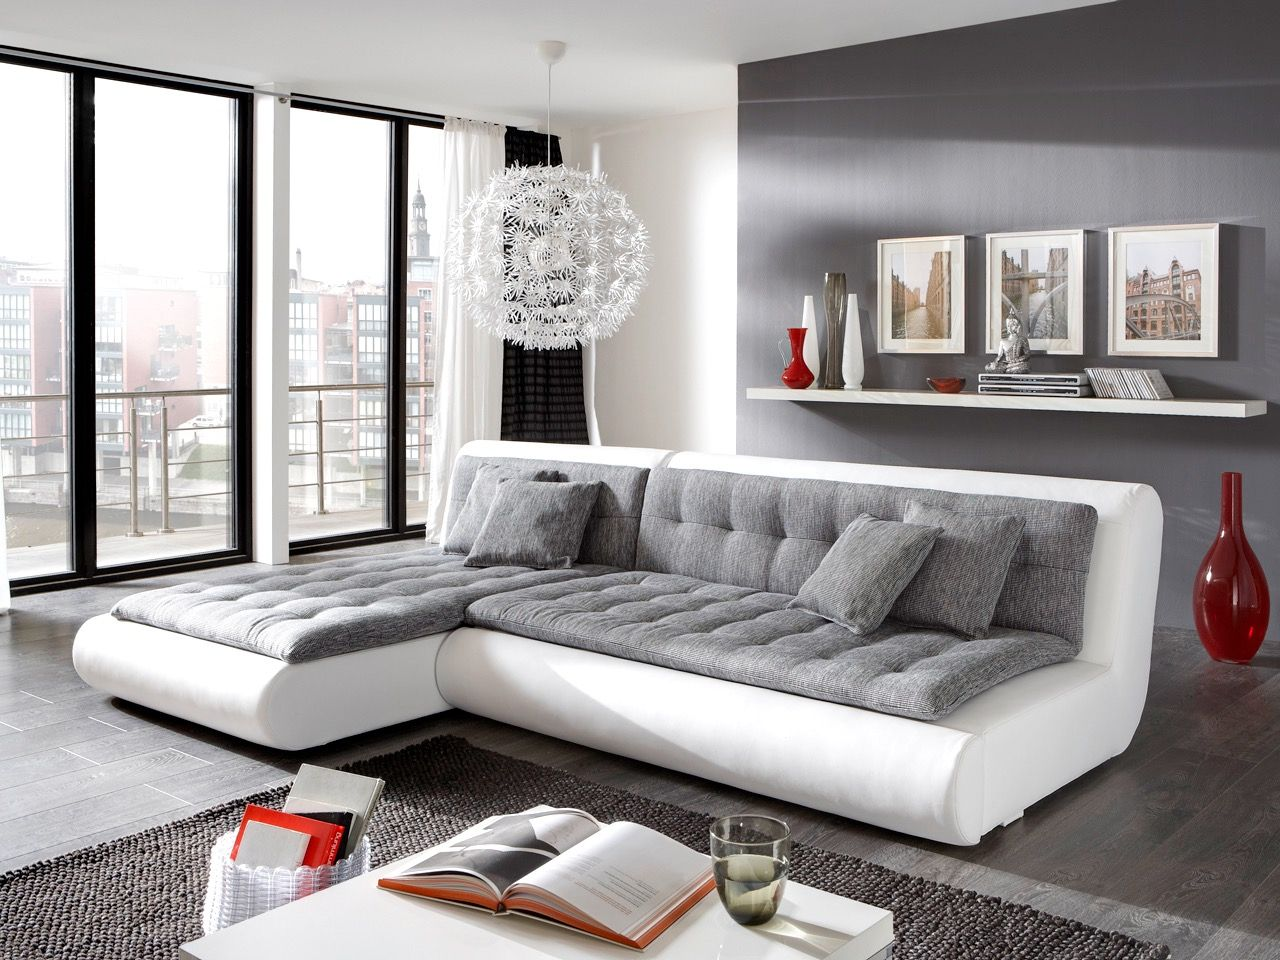 Wohnzimmer Grau Weiß Lila